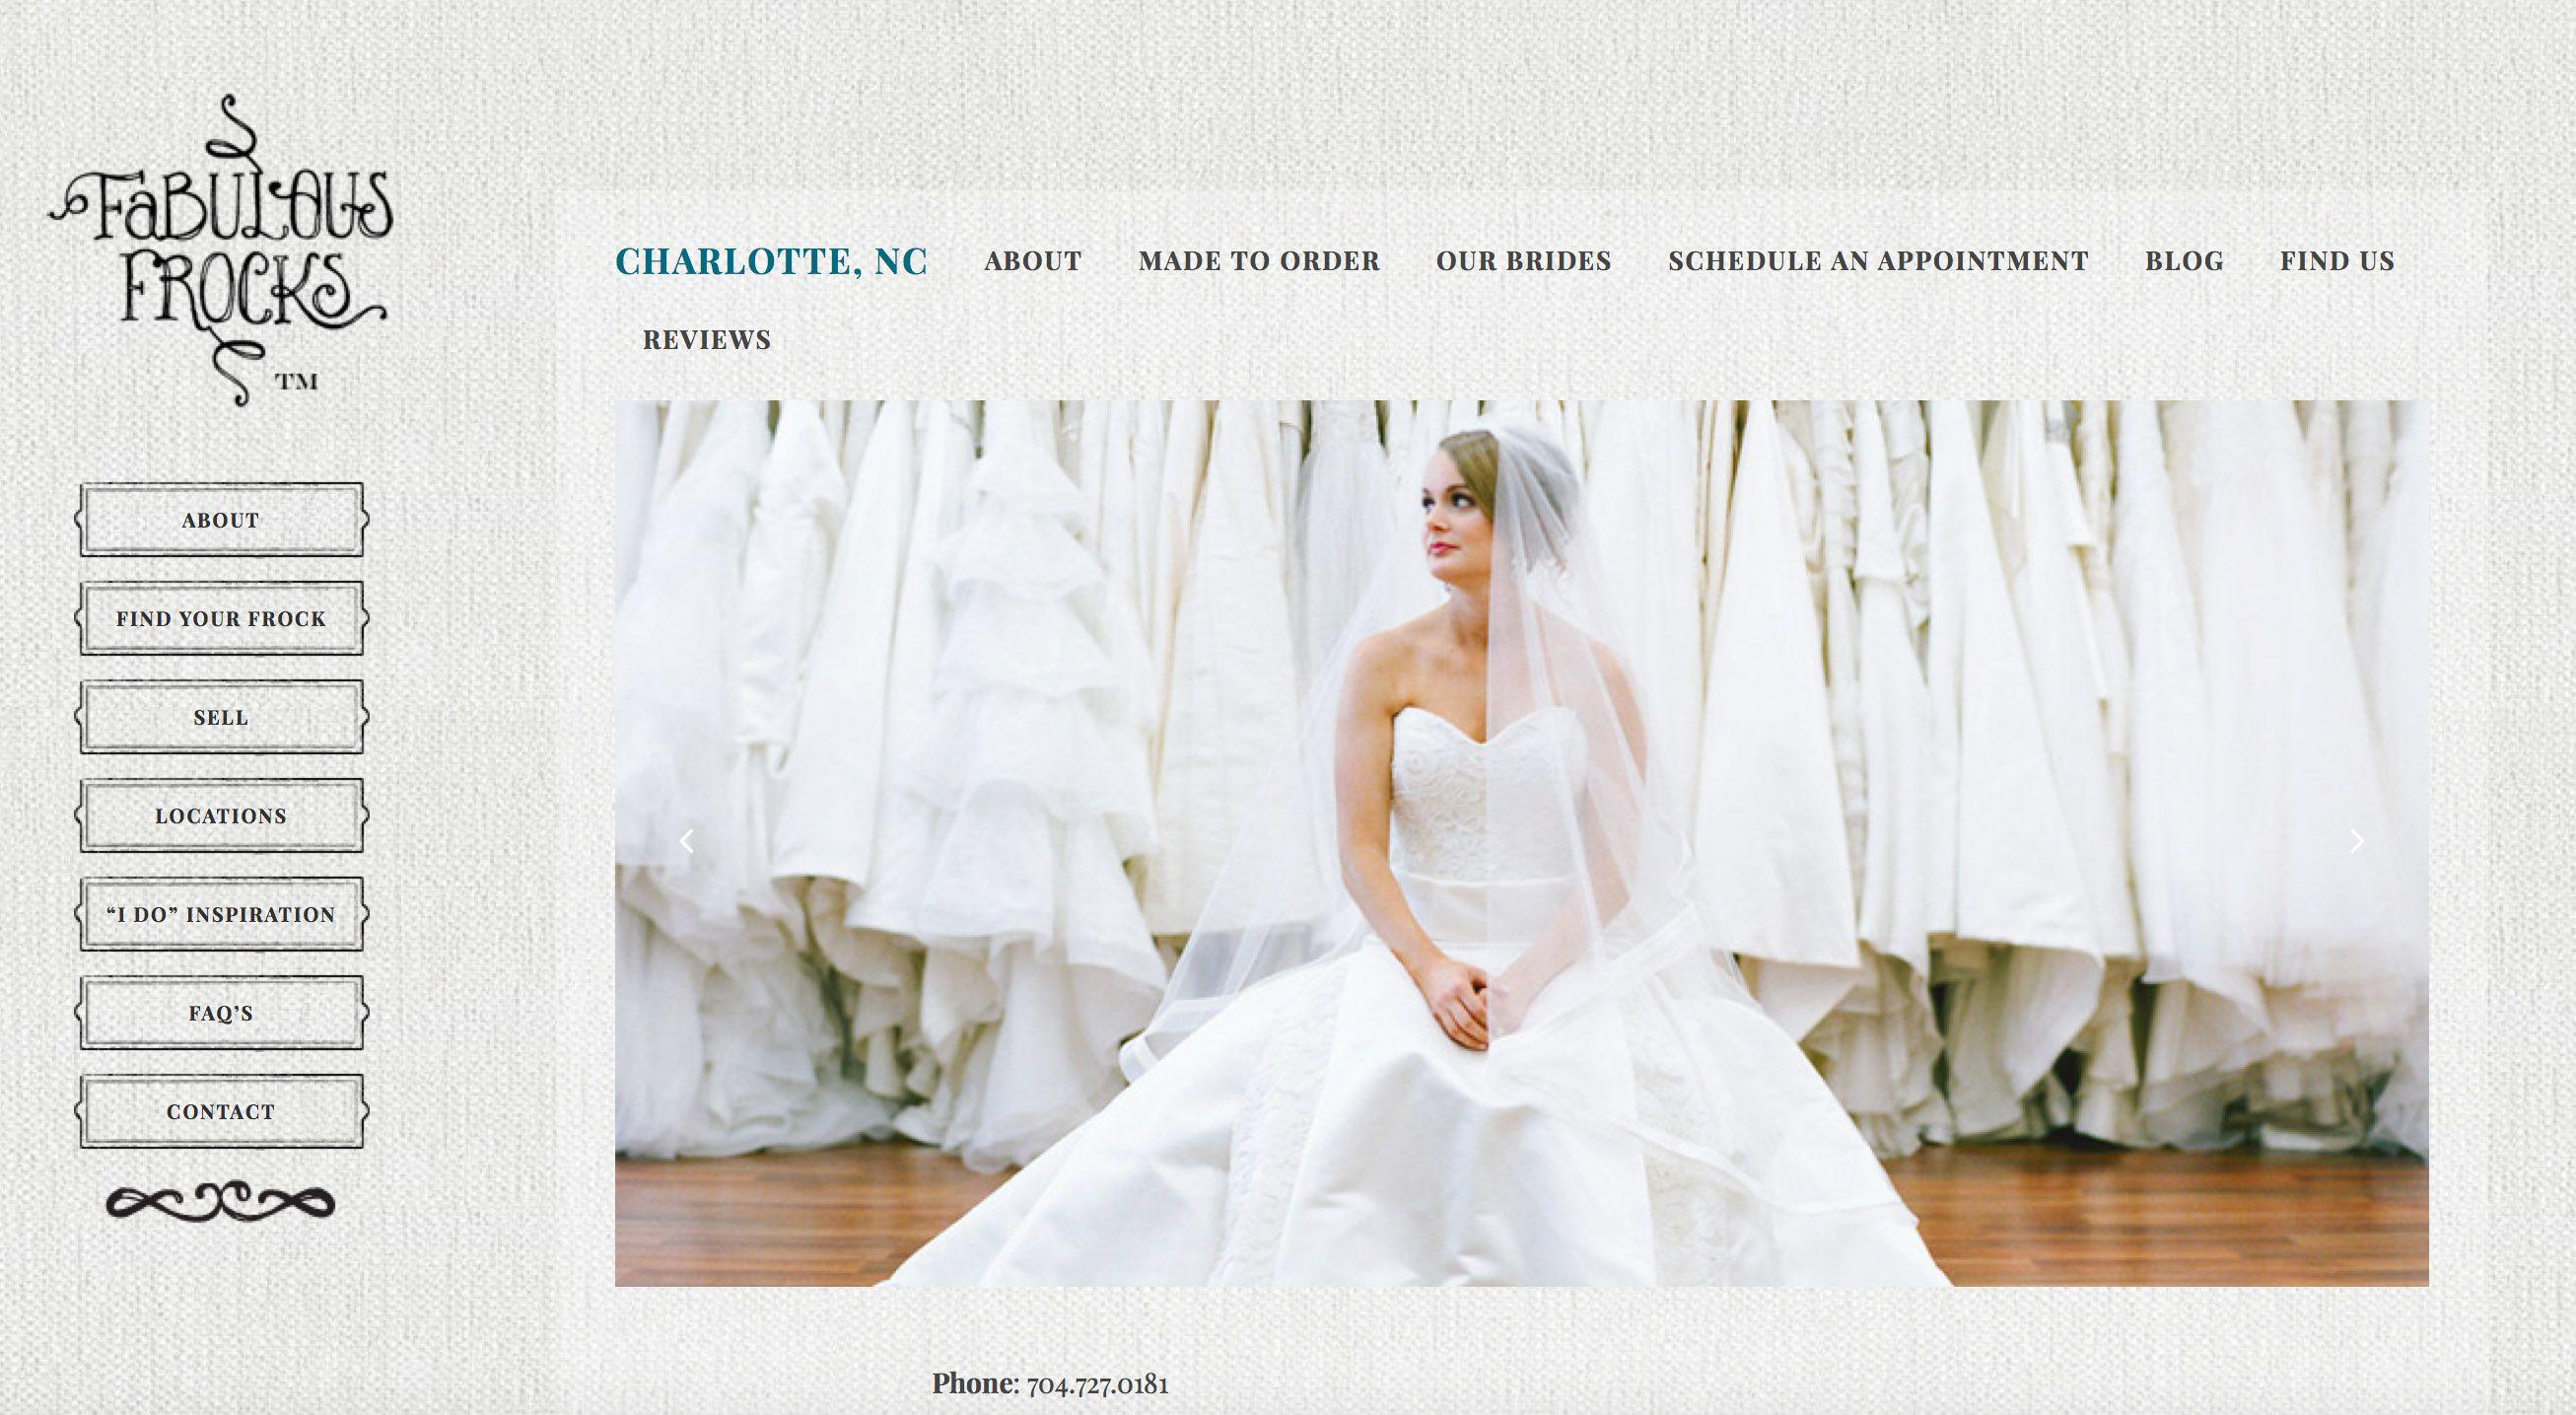 Fabulous Frocks | Charlotte, NC Bridal Shop | Charlotte, NC Wedding ...